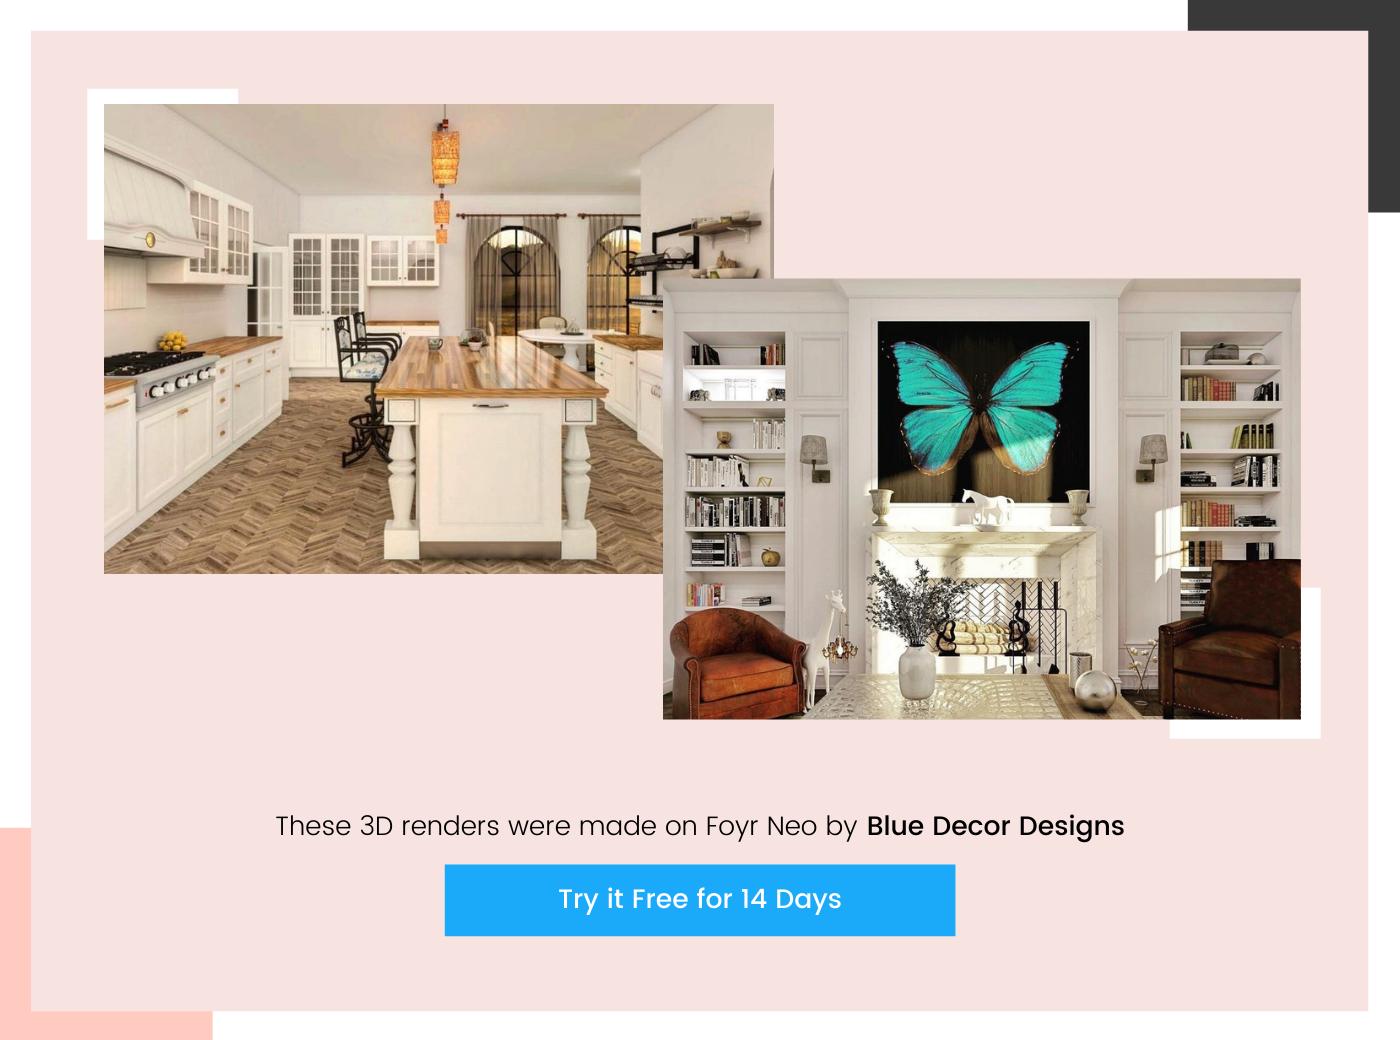 home design render by Blue Decor Designs